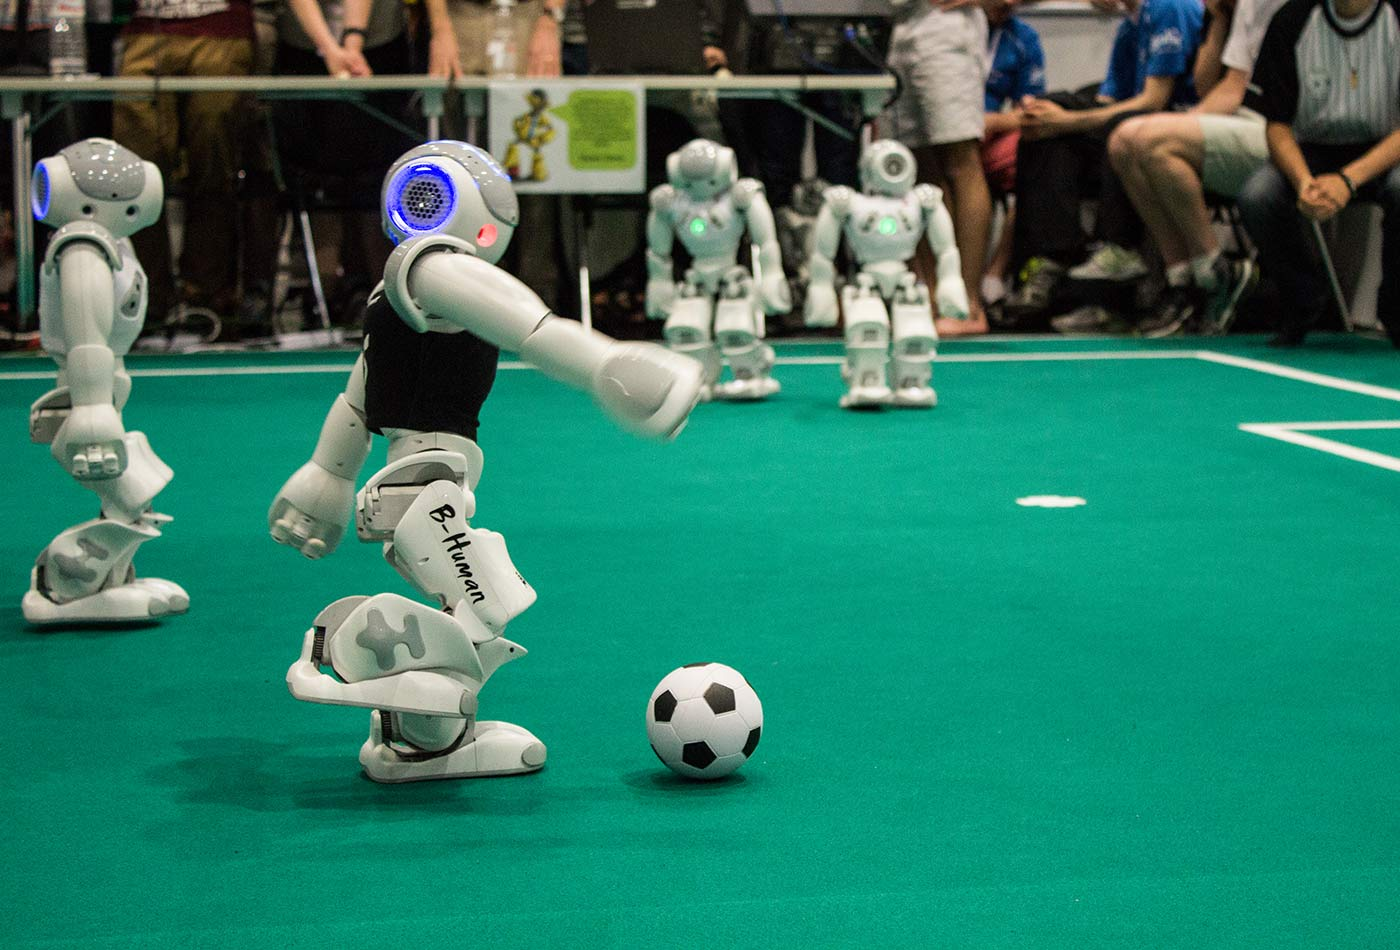 RoboCup 2016, Leipzig